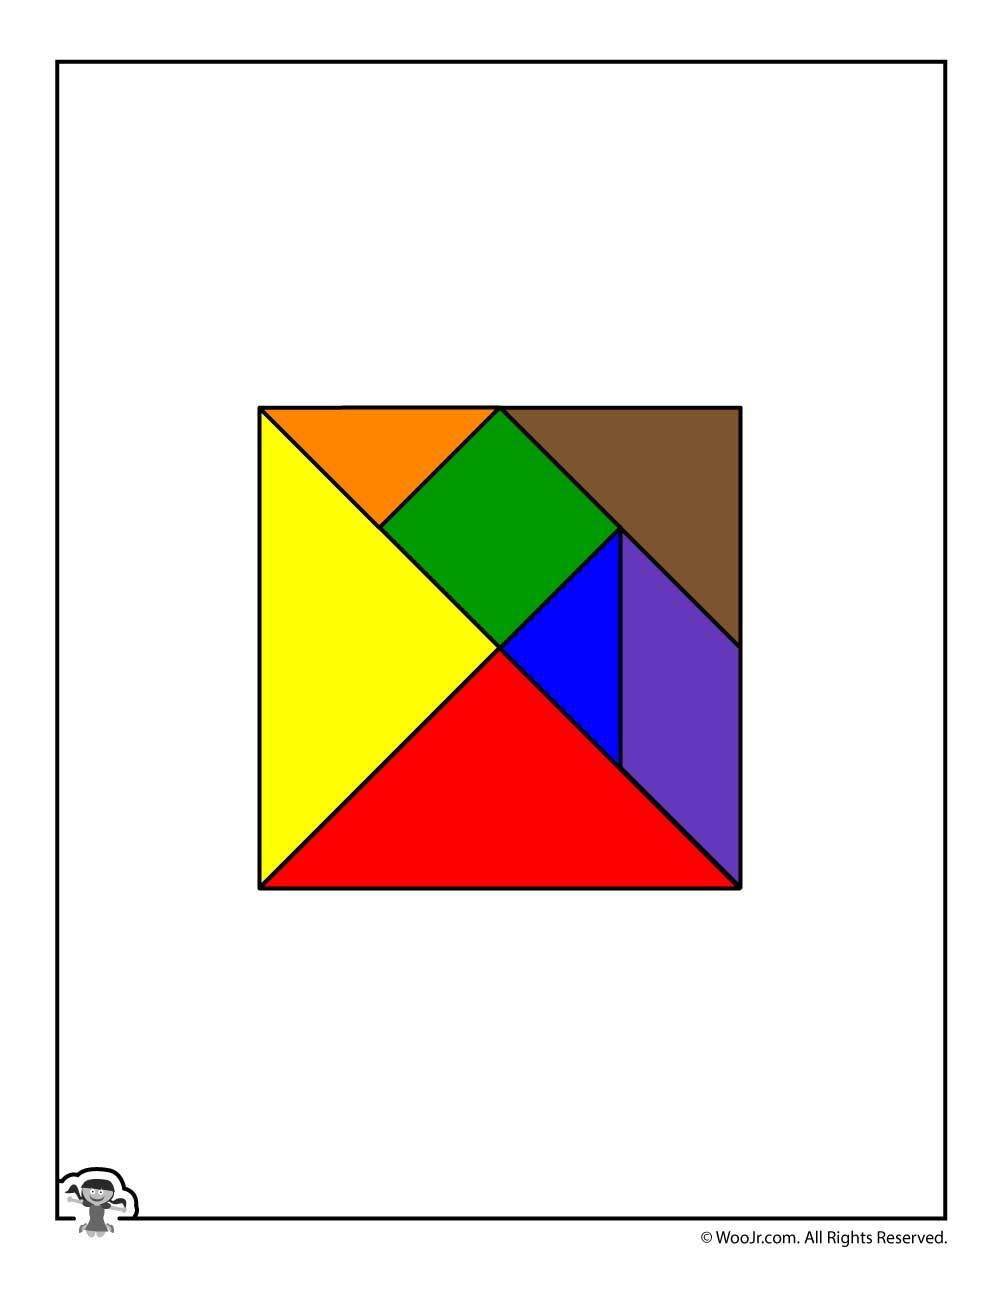 Printable Tangram Puzzle Pieces | Woo! Jr. Kids Activities - Printable Tangram Puzzle